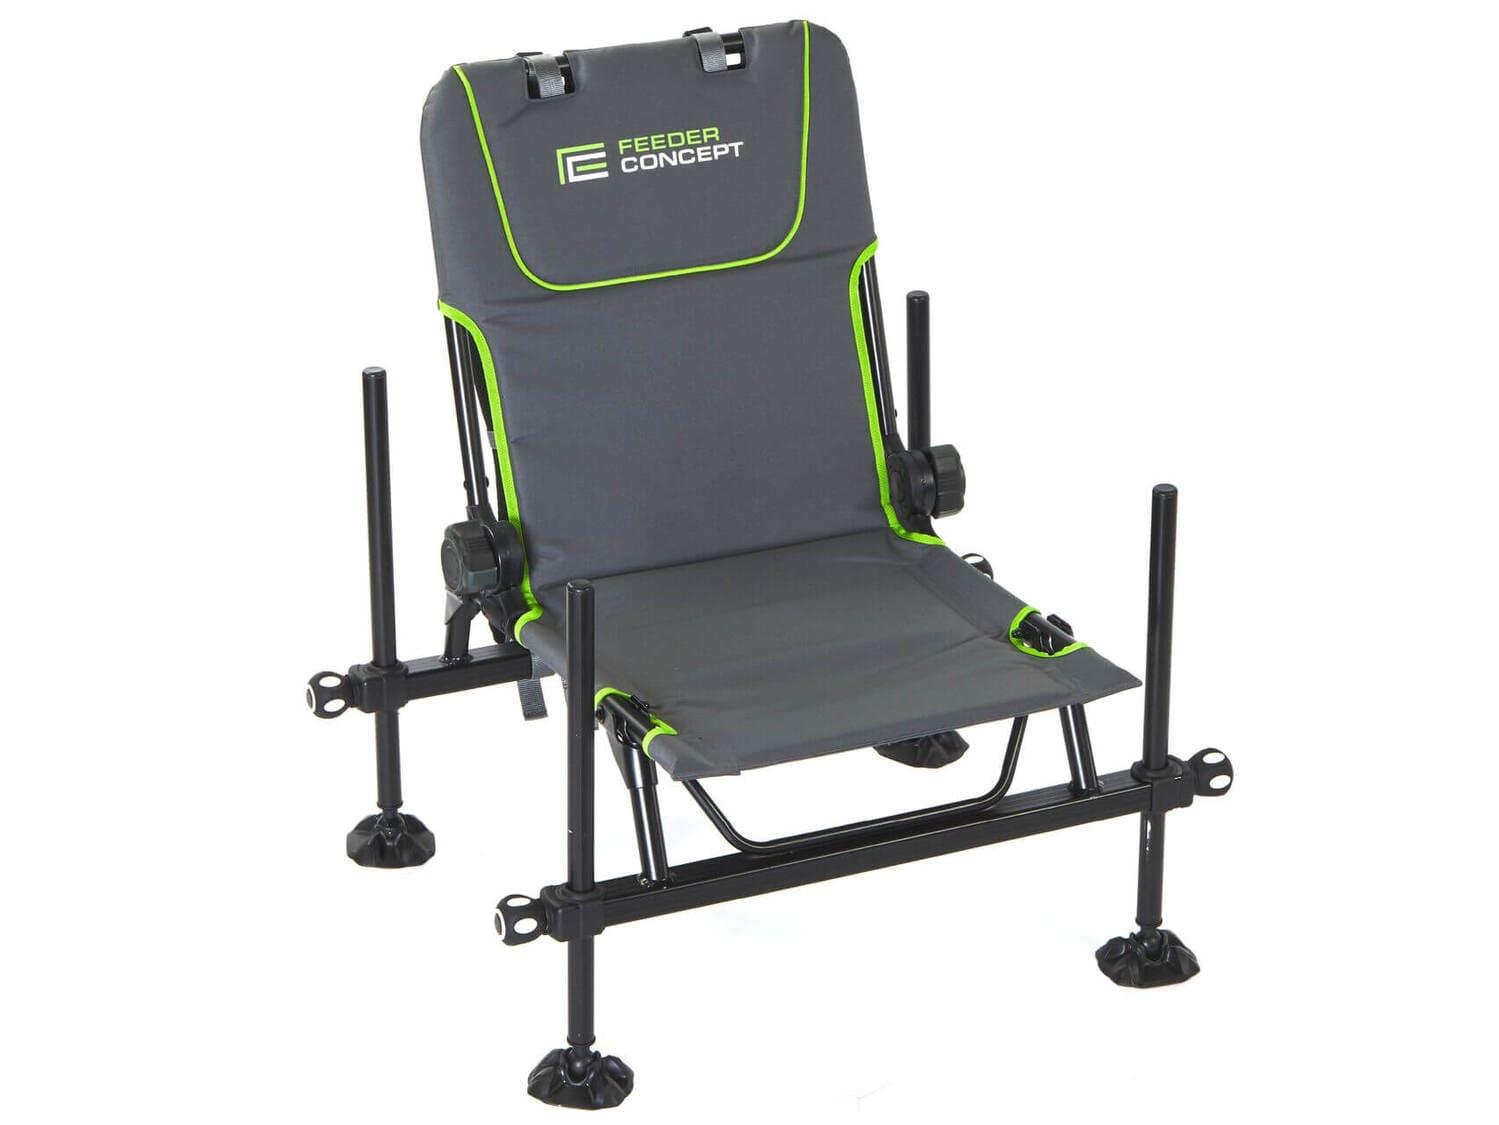 Кресло фидерное Feeder Concept COMPACT